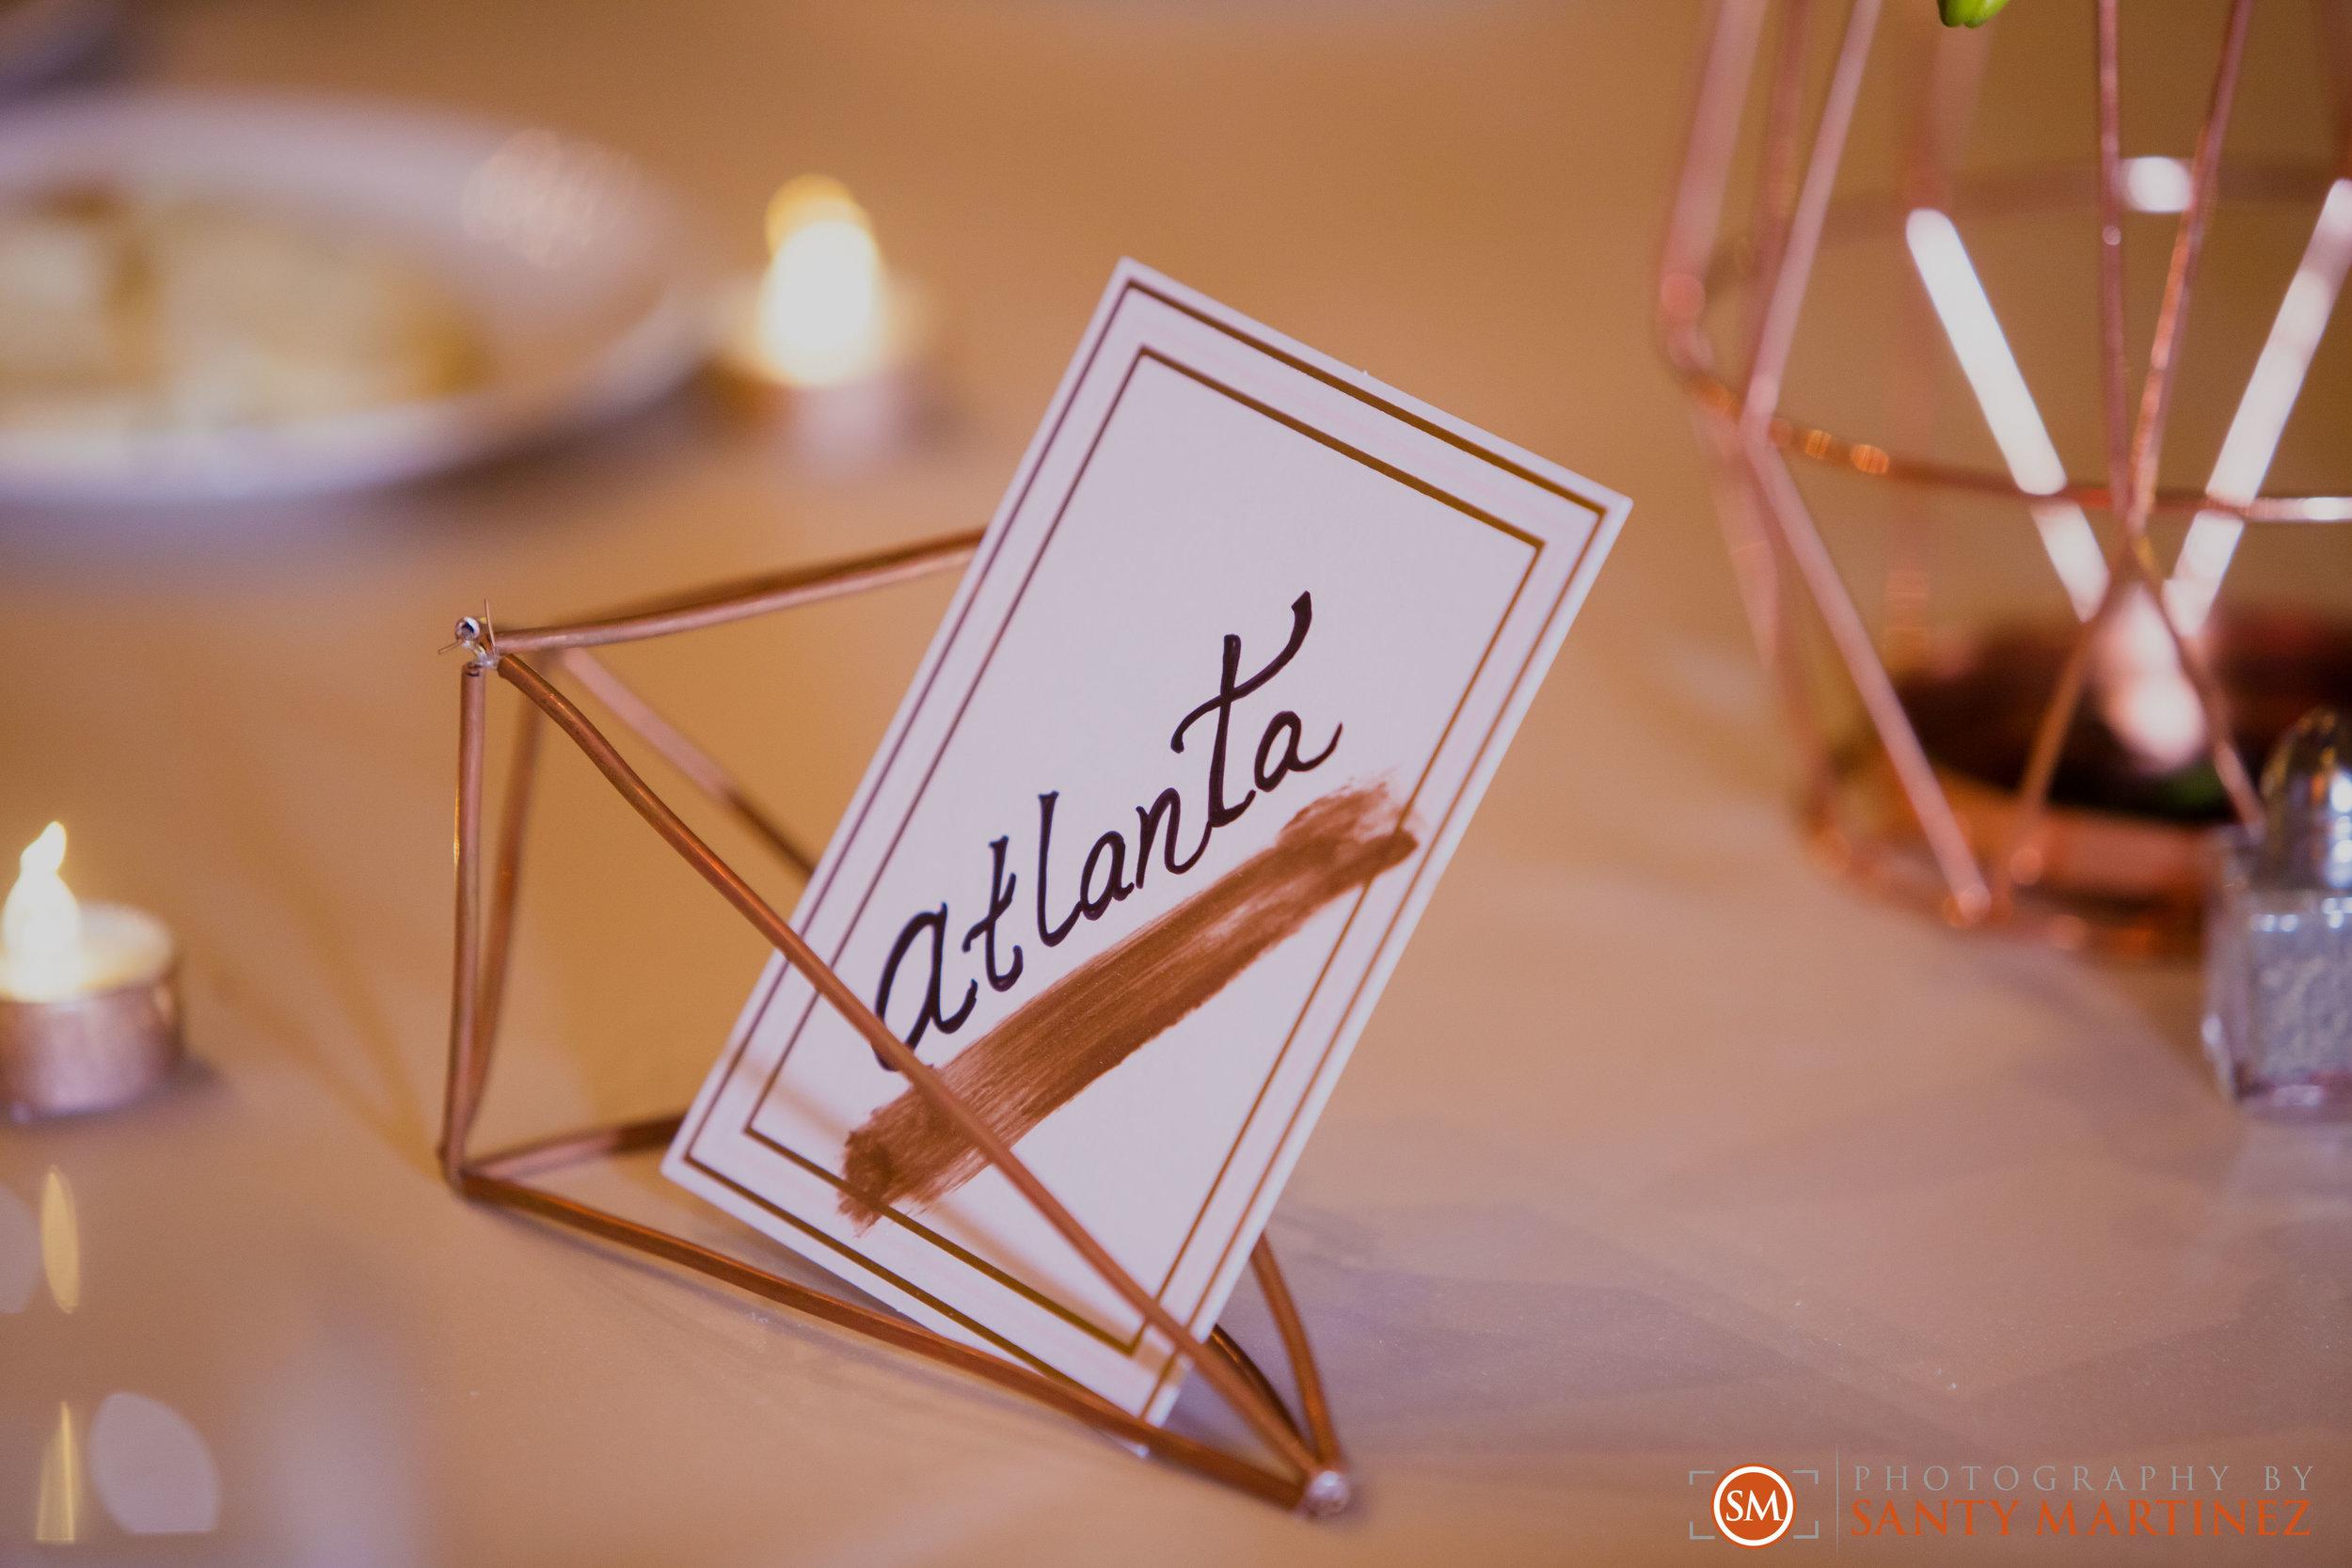 Wedding Bonnet House - Photography by Santy Martinez-35.jpg